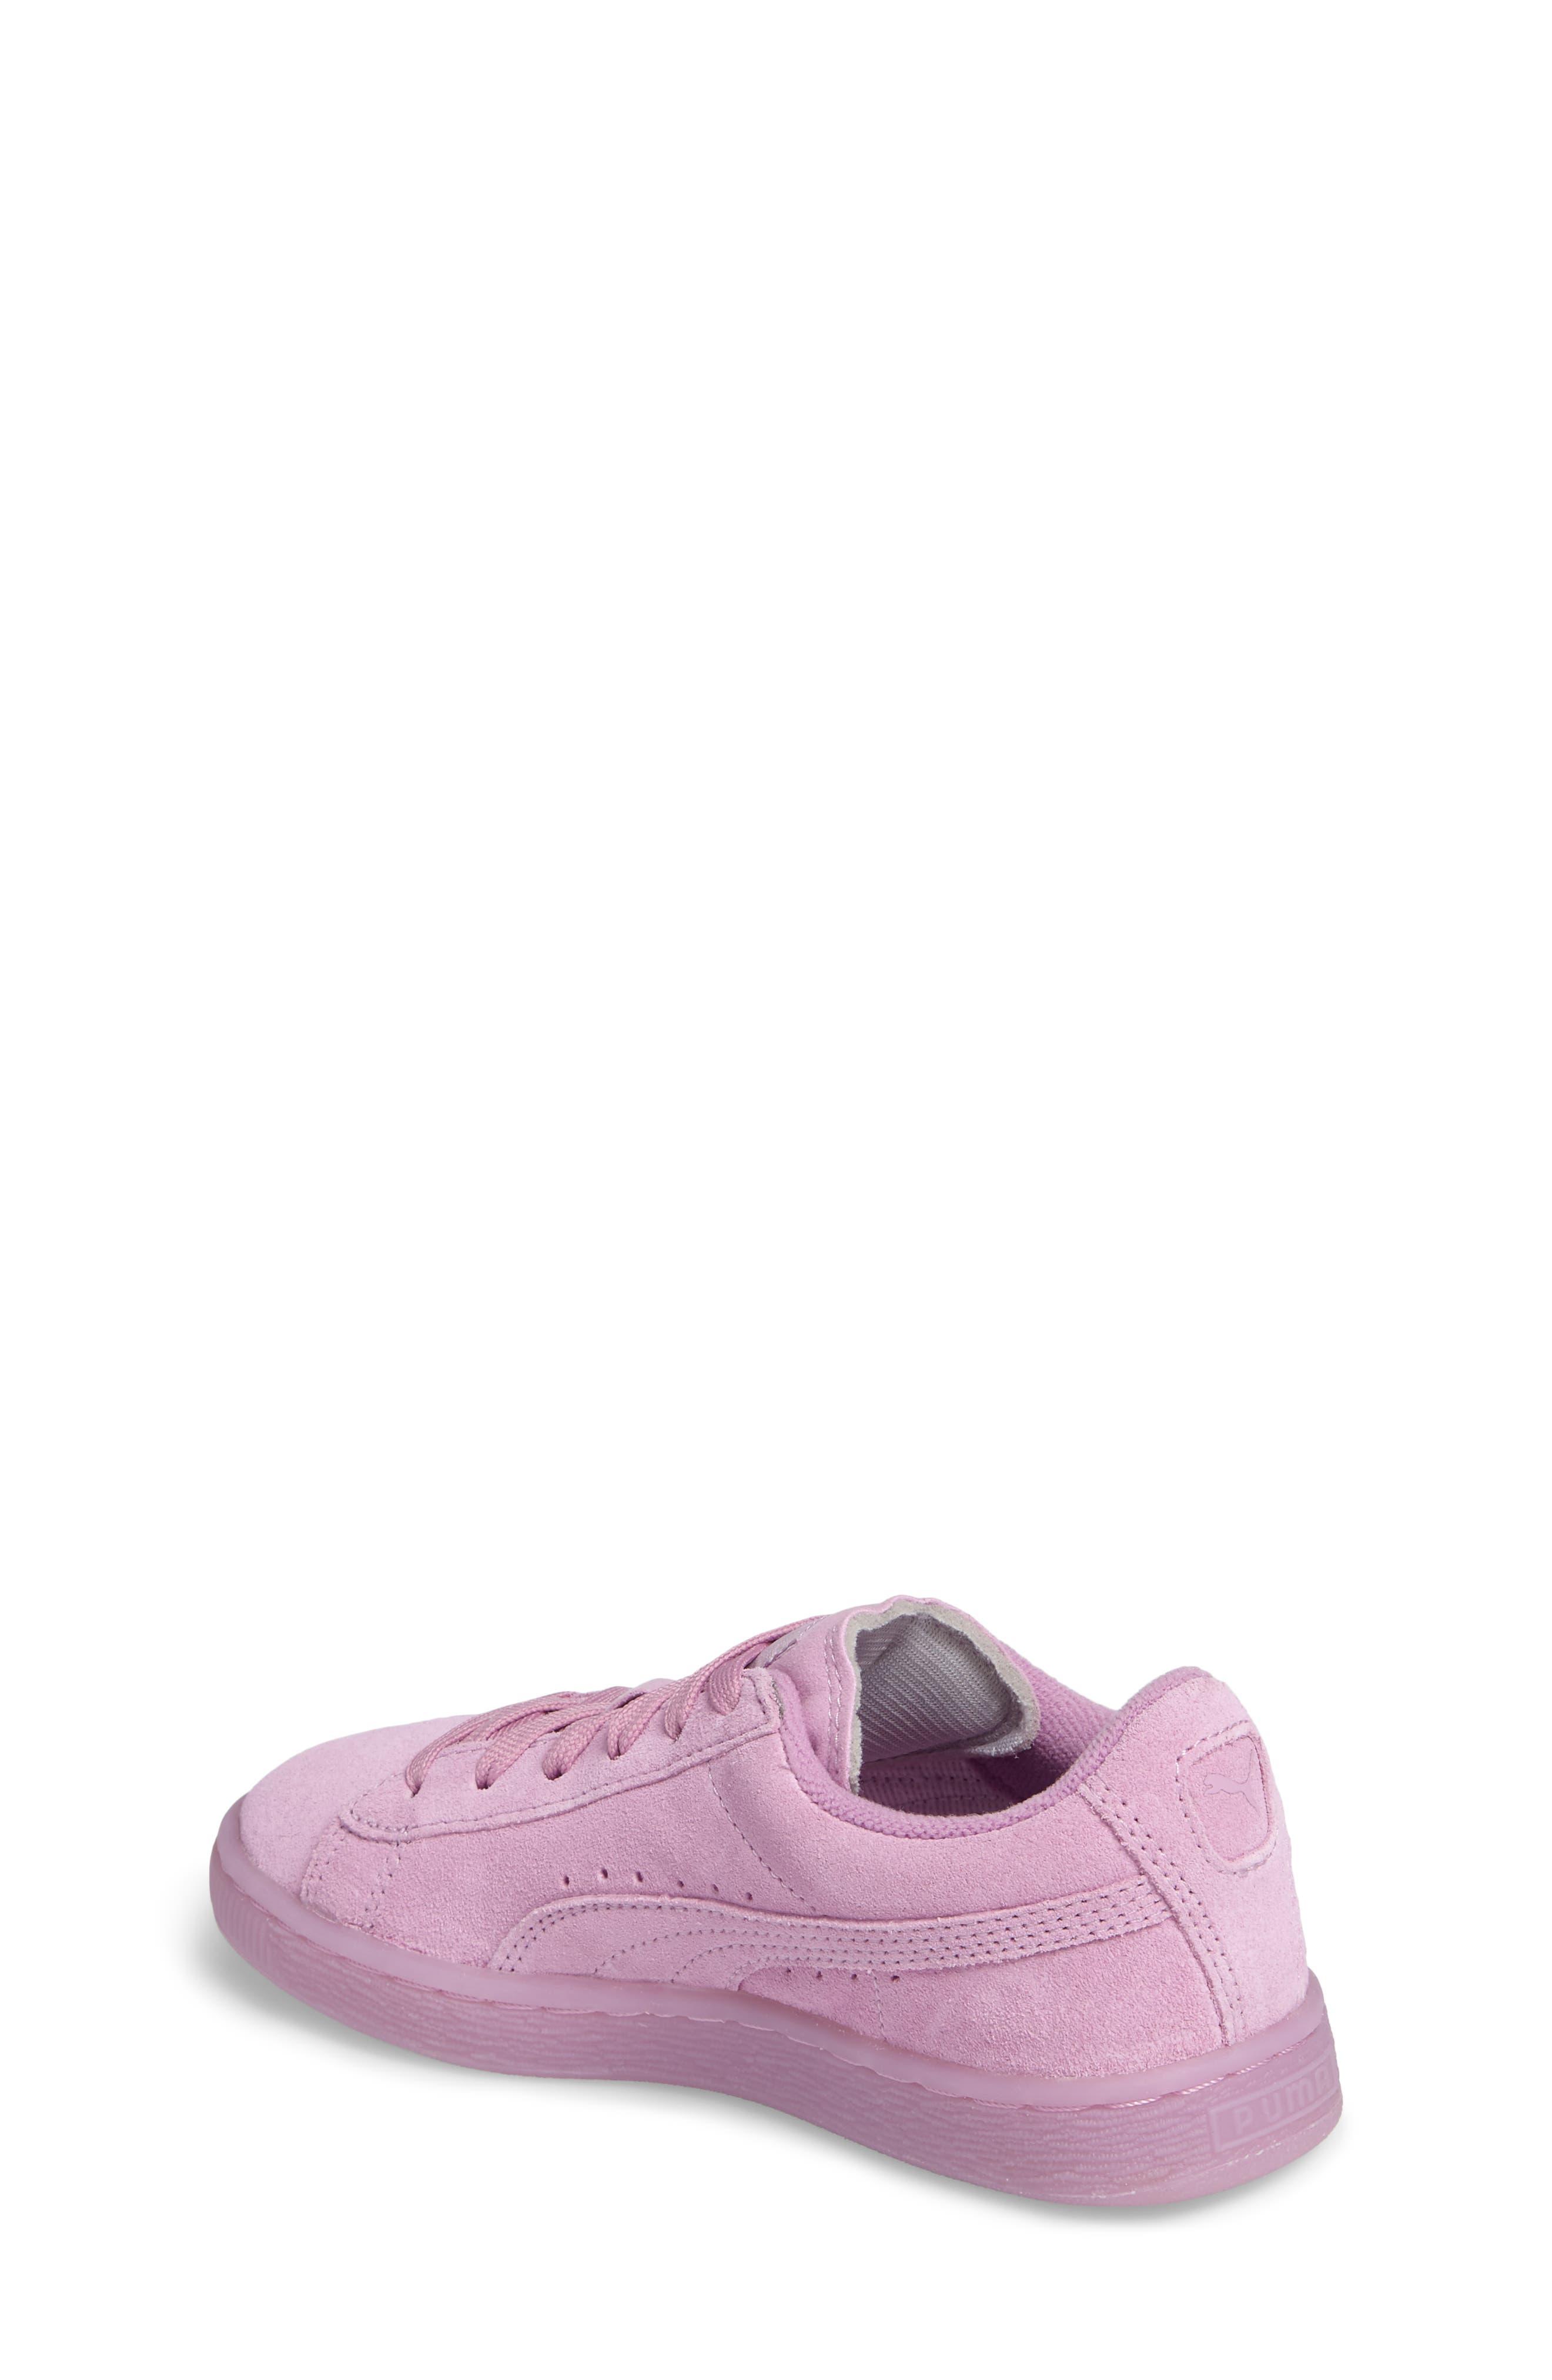 Alternate Image 2  - PUMA Iced Sneaker (Toddler, Little Kid & Big Kid)